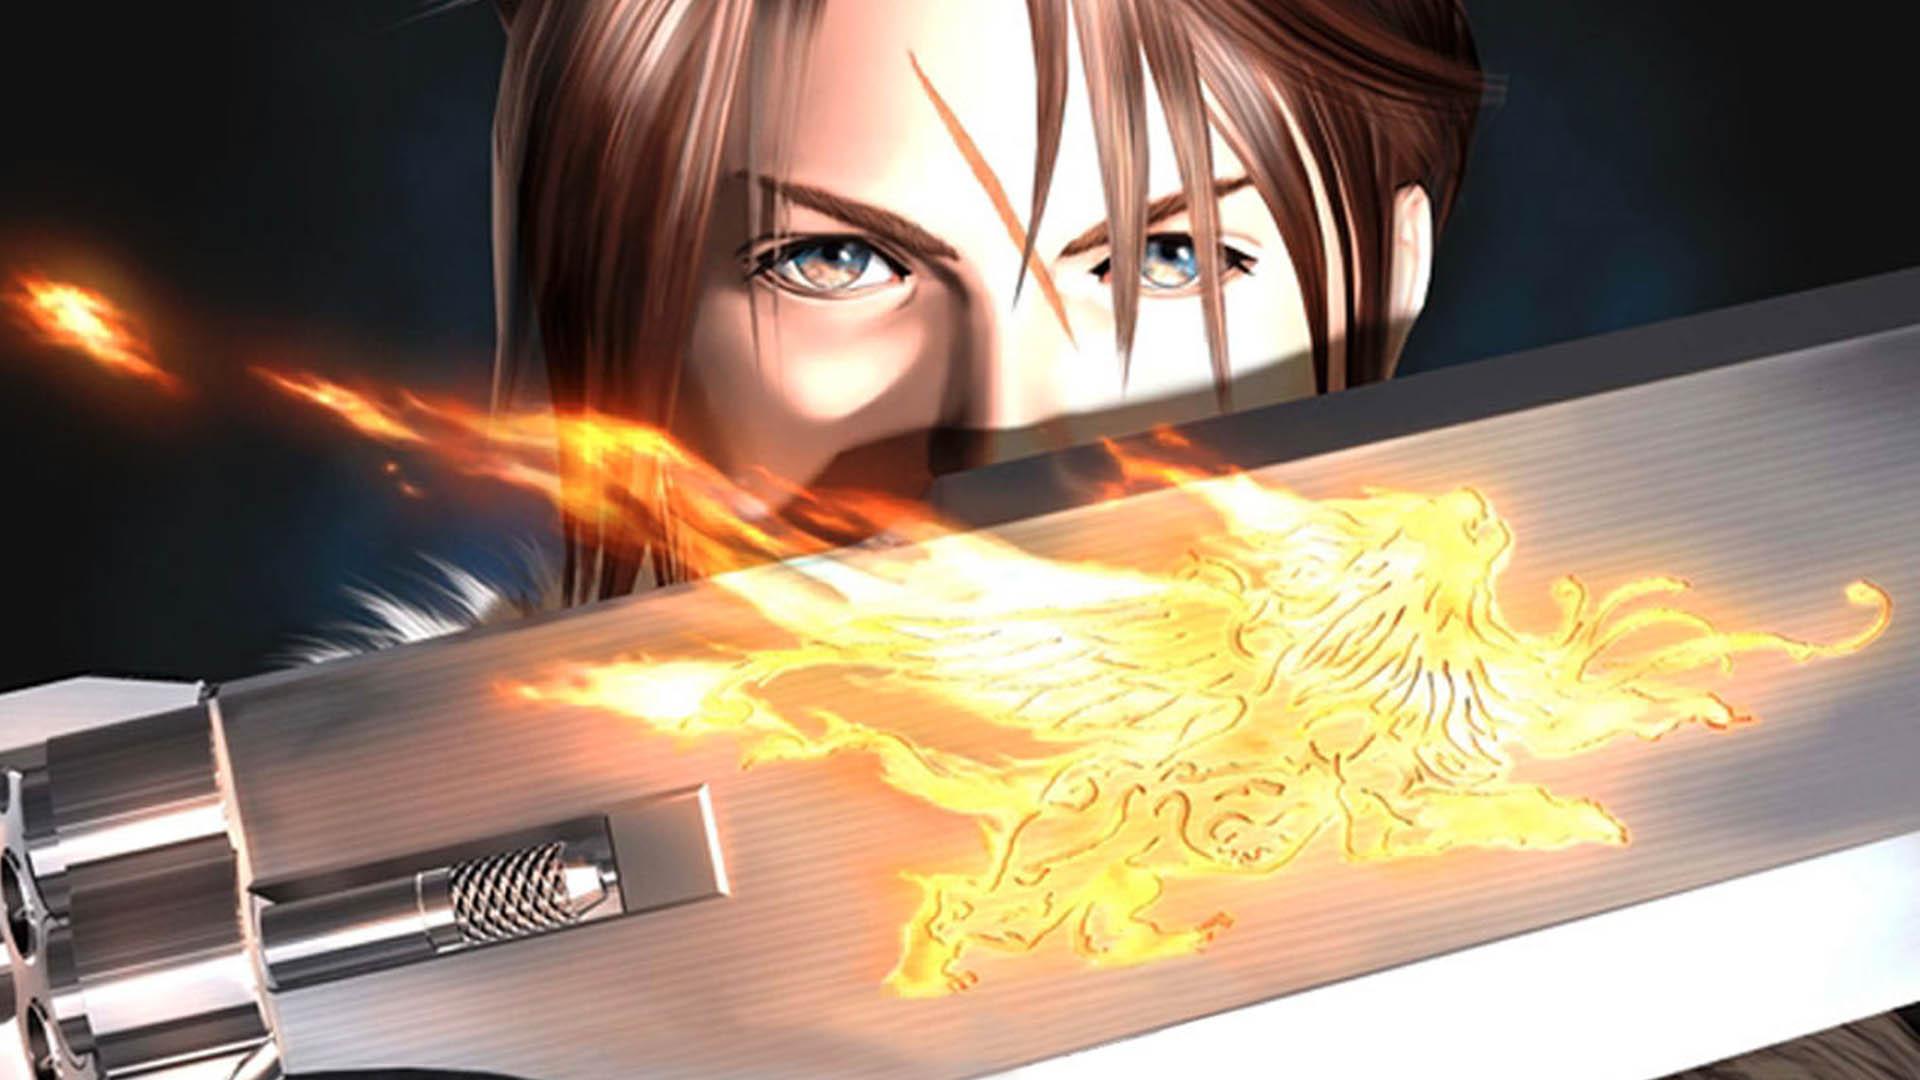 Final Fantasy 8 بیش از ۹٫۶ میلیون نسخه به فروش رسانده است